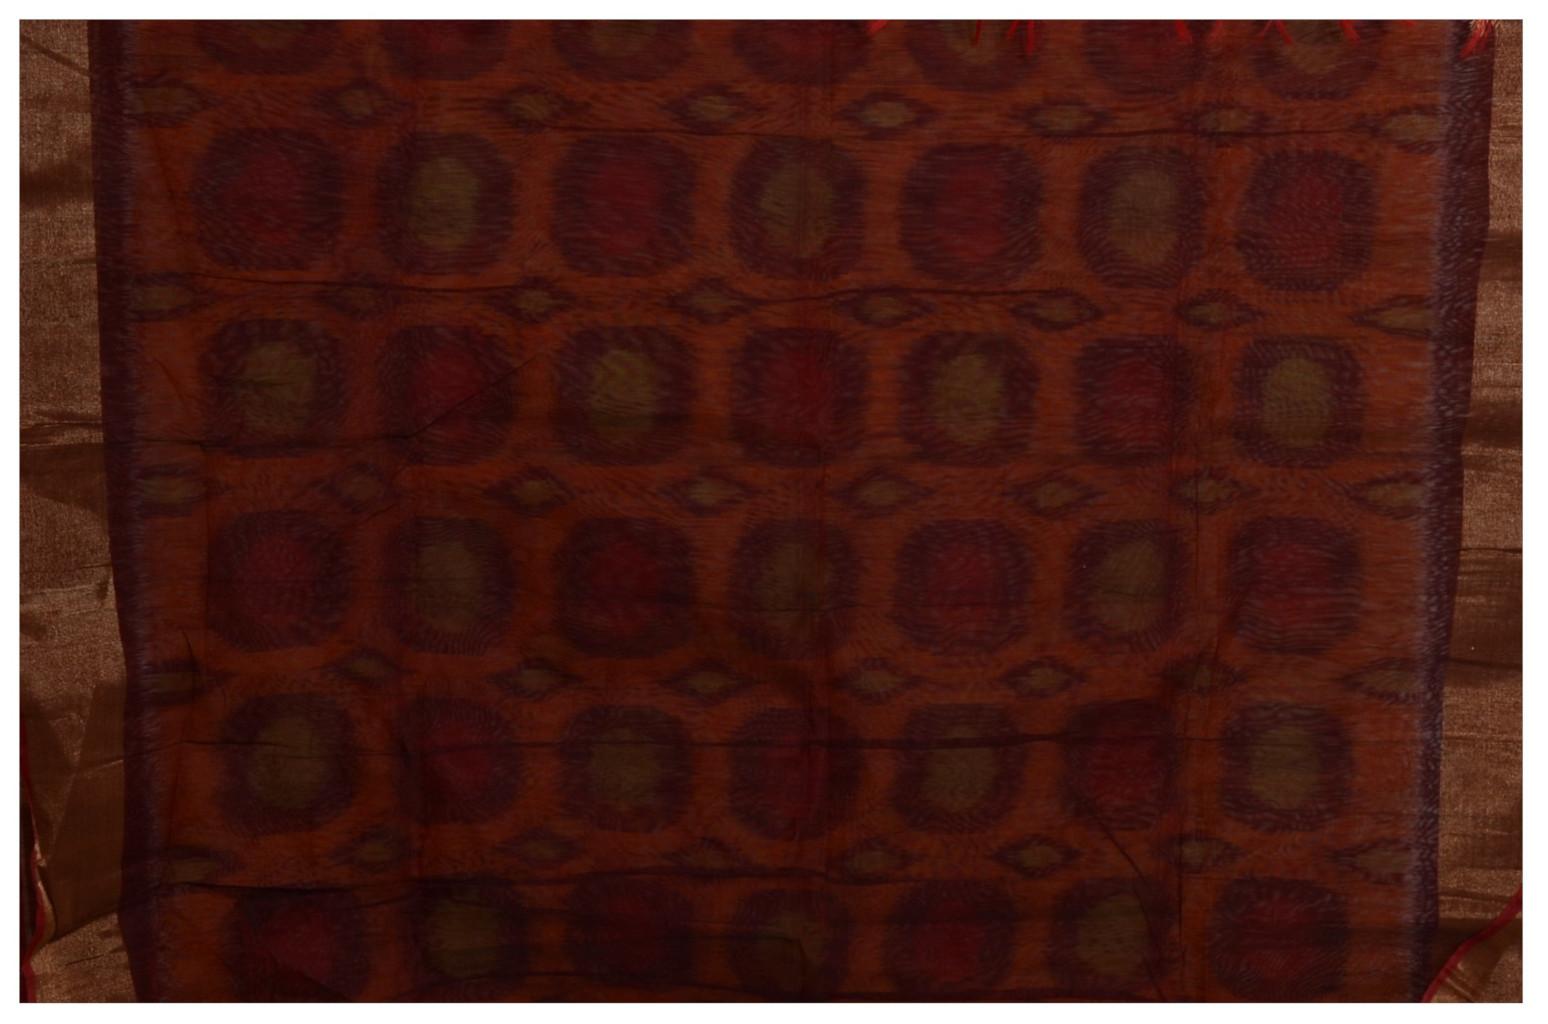 Pochampally Ikat Mercerised Cotton Saree Rusty Orange : Picture